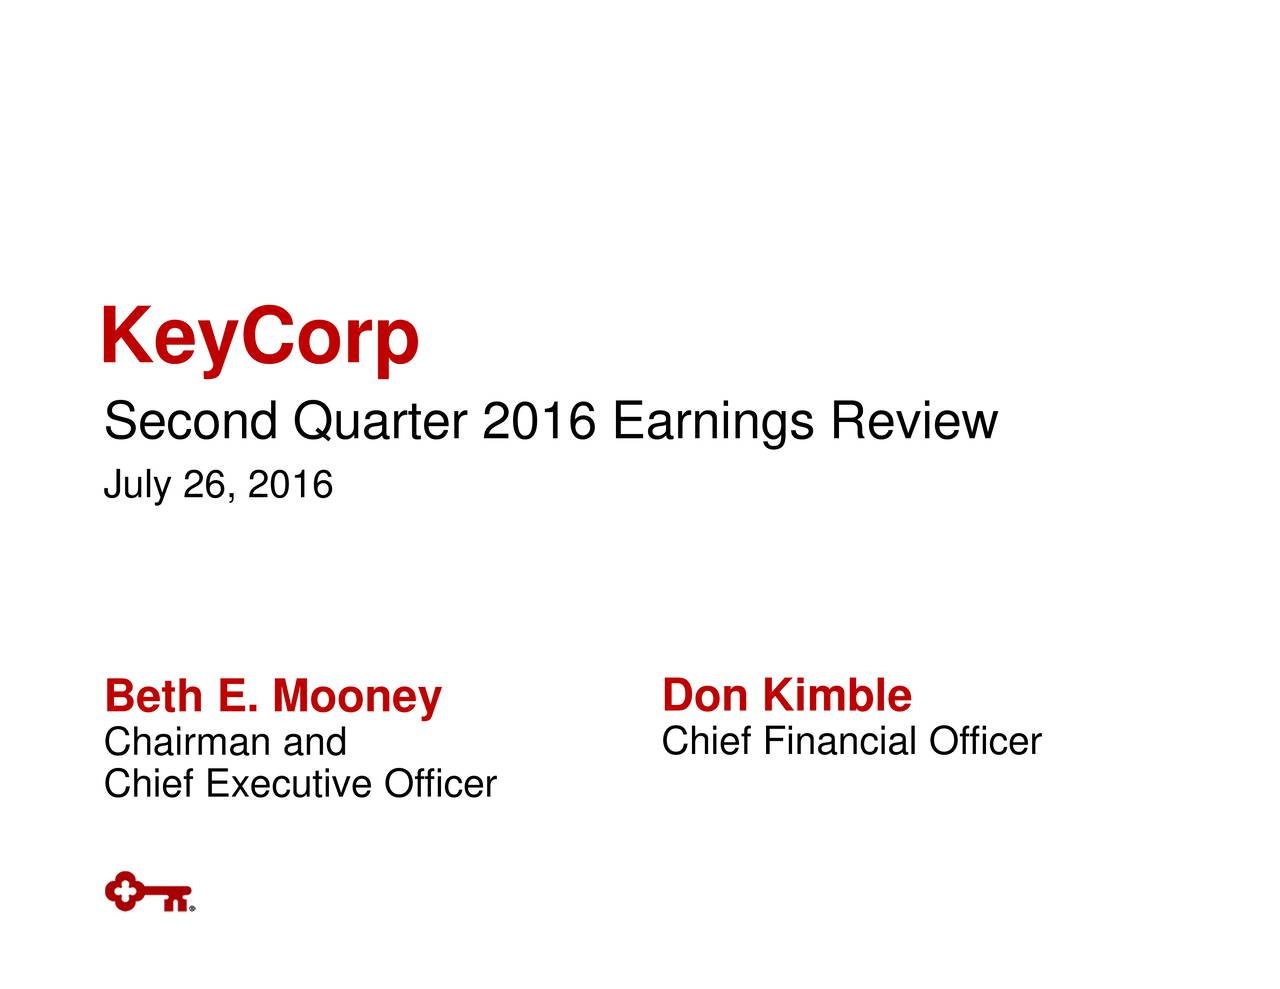 KeyCorpon26,2u16rter 2016 Earnings Review